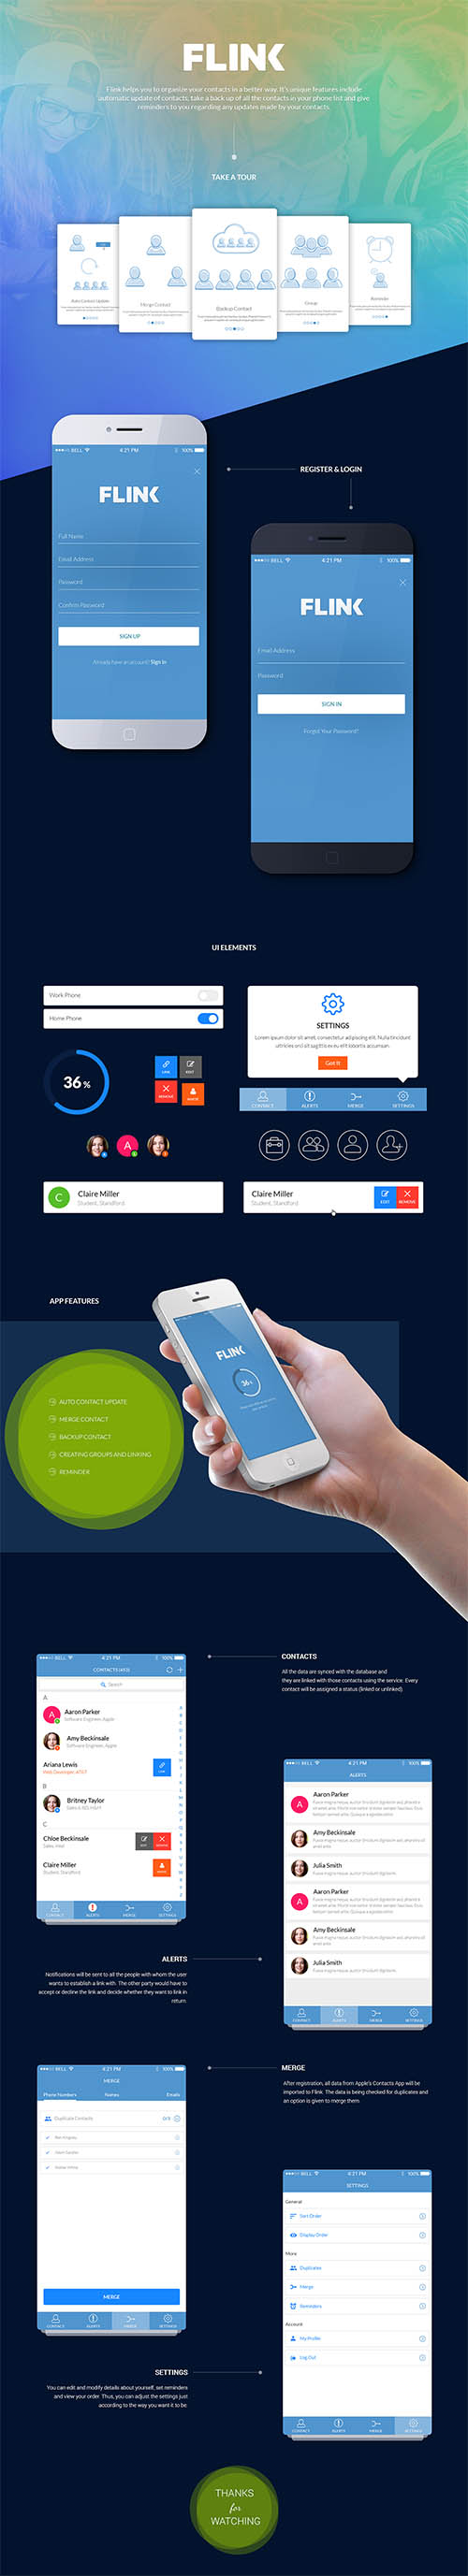 Contact app UI By Chanchal Pramanik